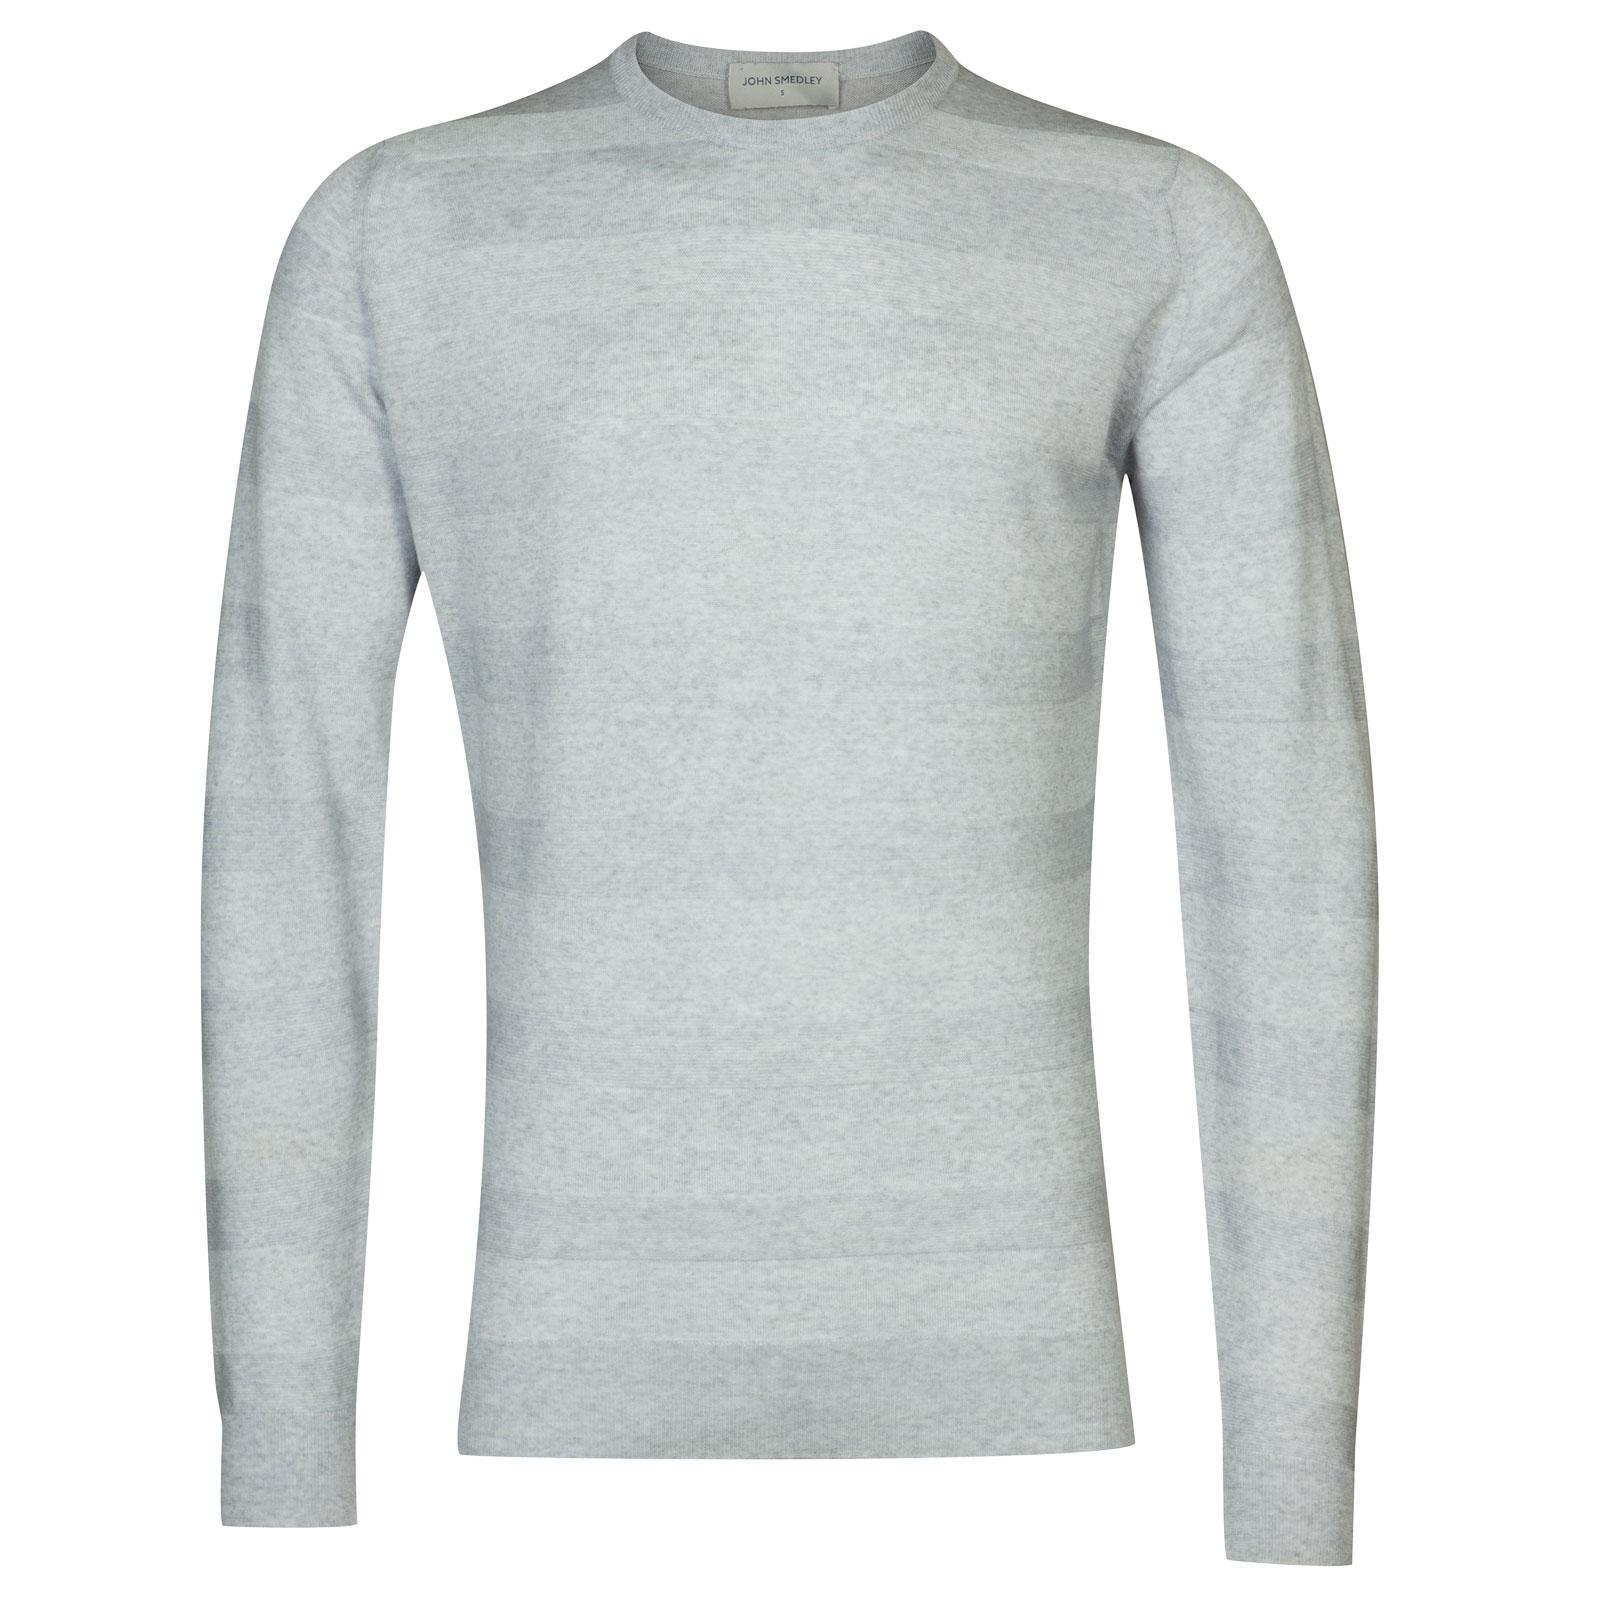 John Smedley coplow Merino Wool Pullover in Bardot Grey-XL